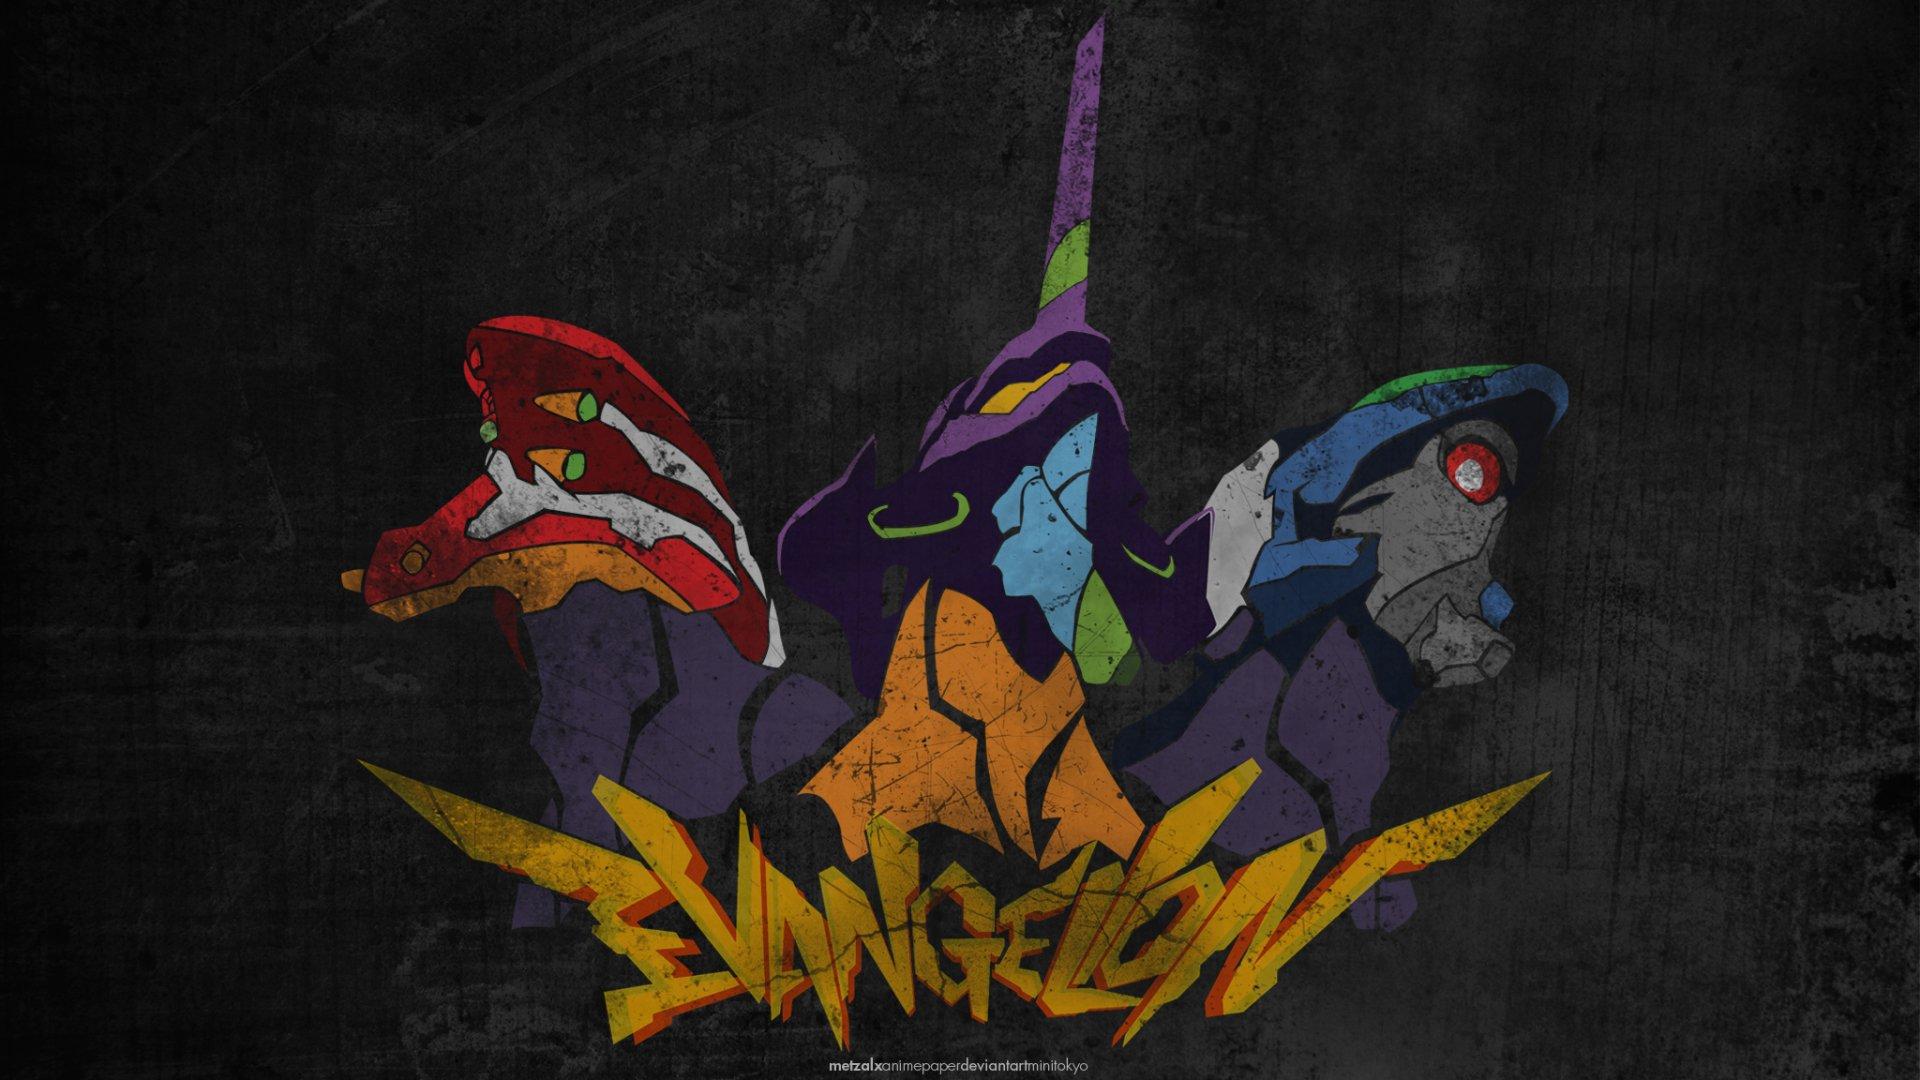 Neon Genesis Evangelion HD Wallpaper | Background Image ...